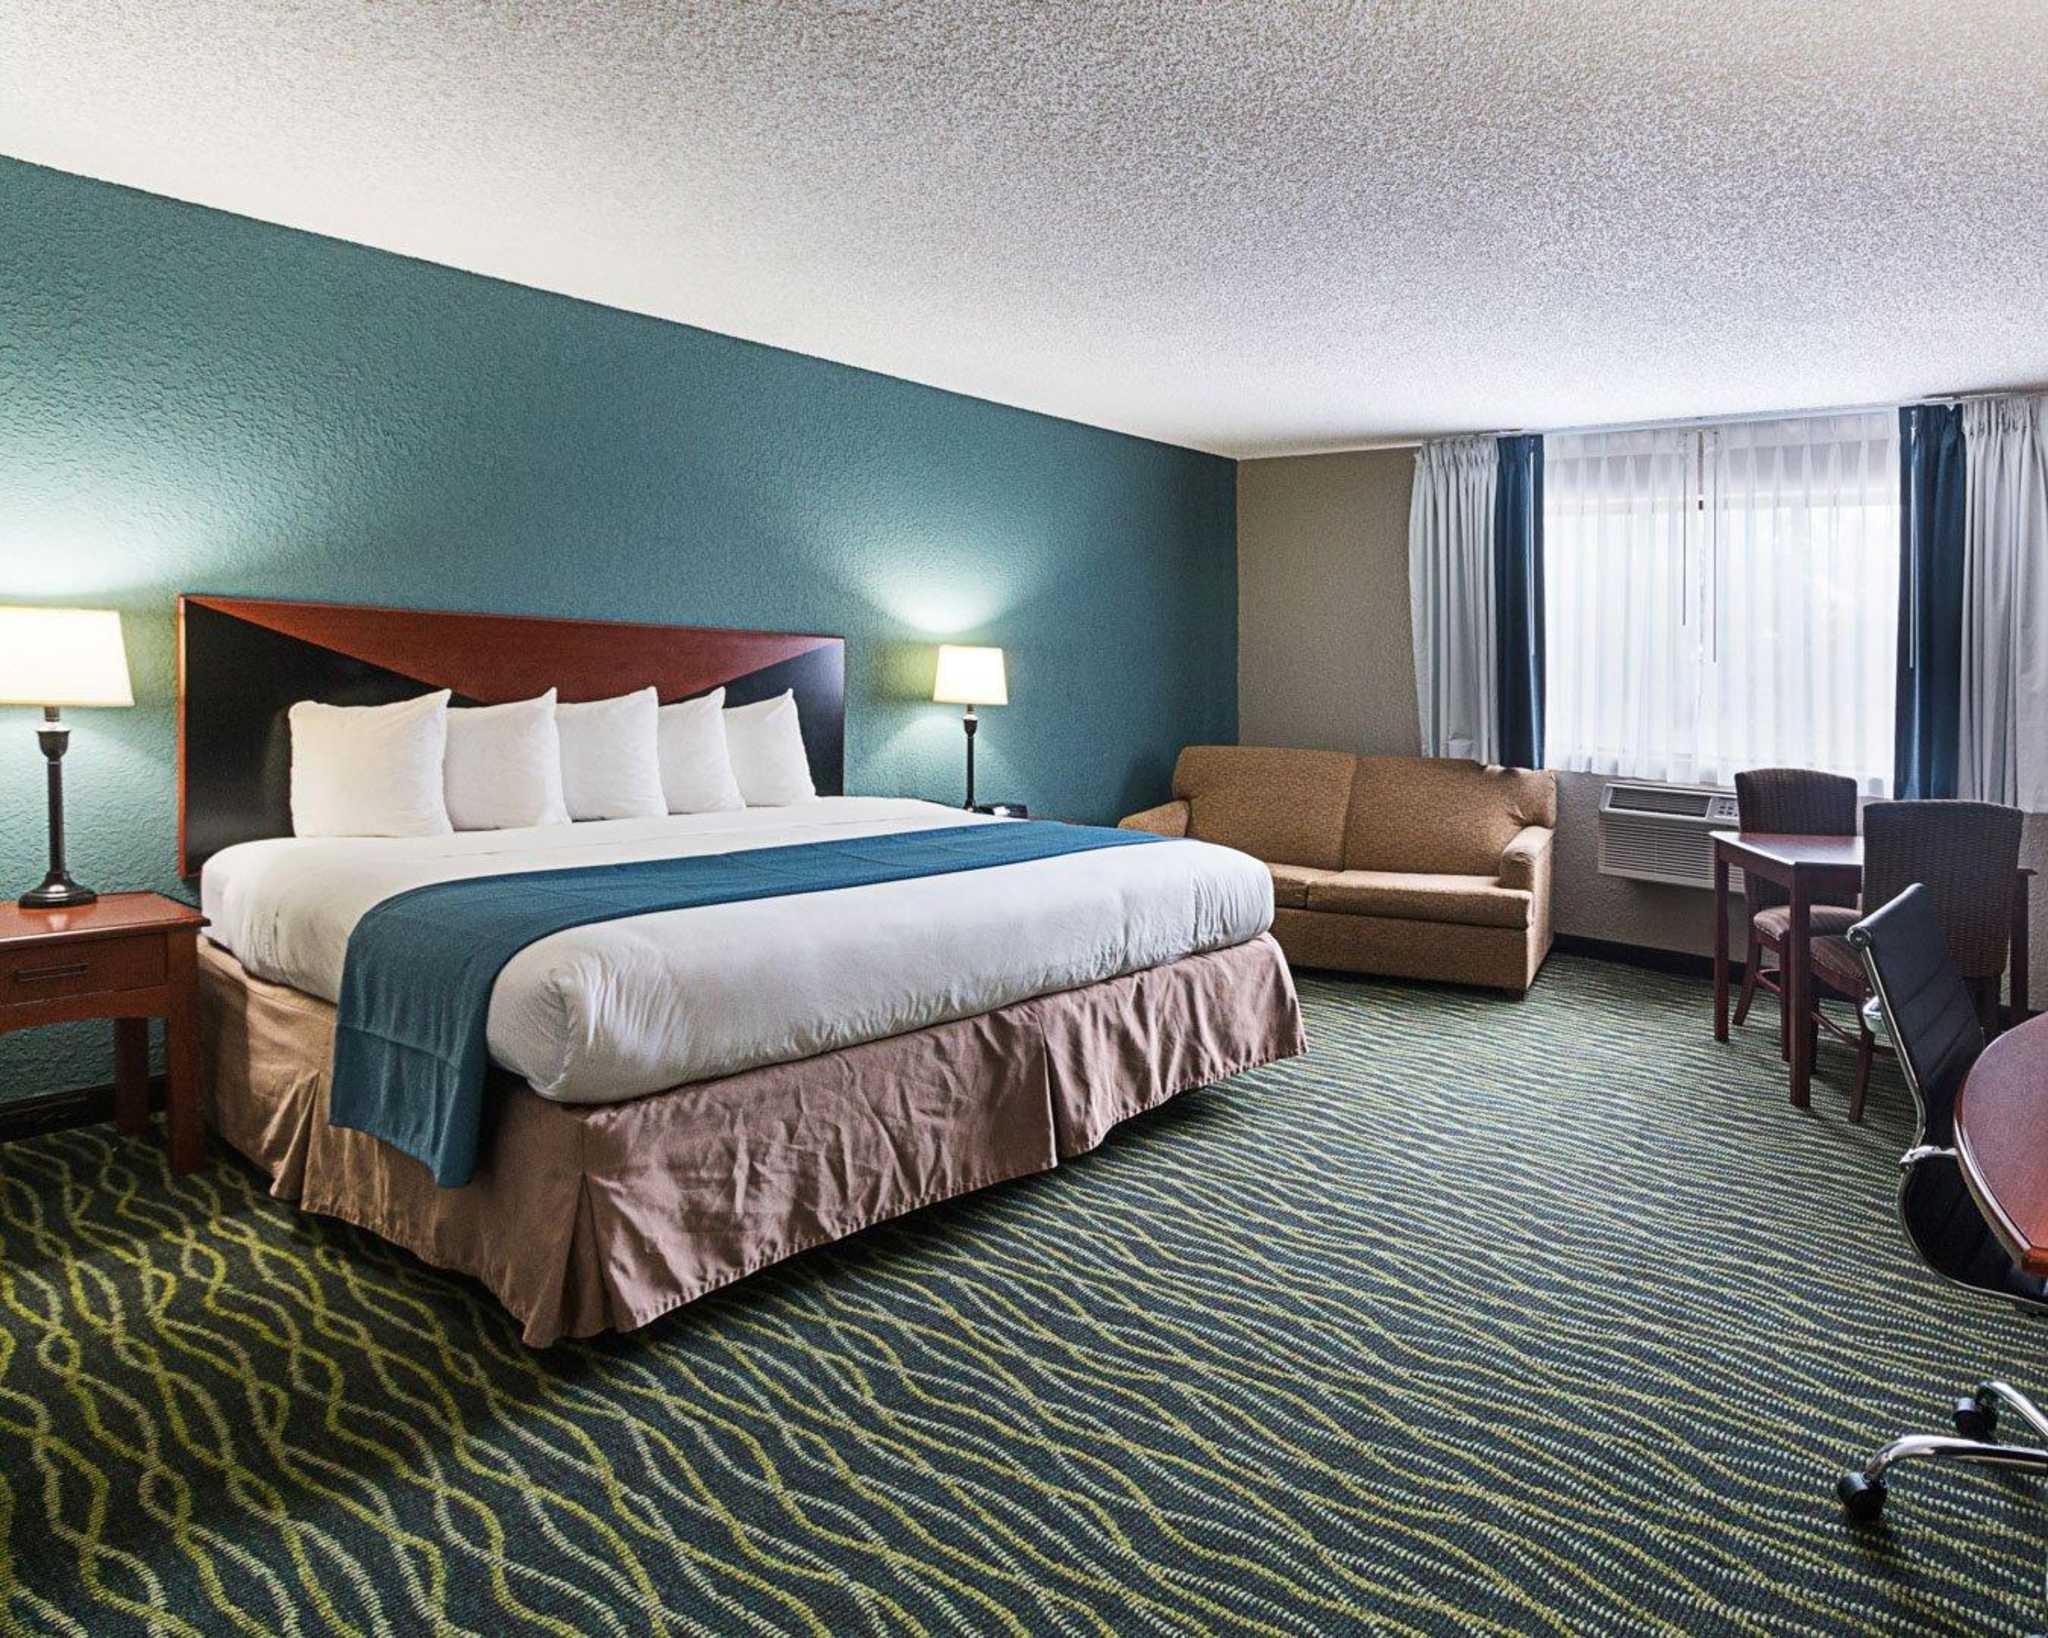 Quality Inn Hotel Leesburg Fl 34748